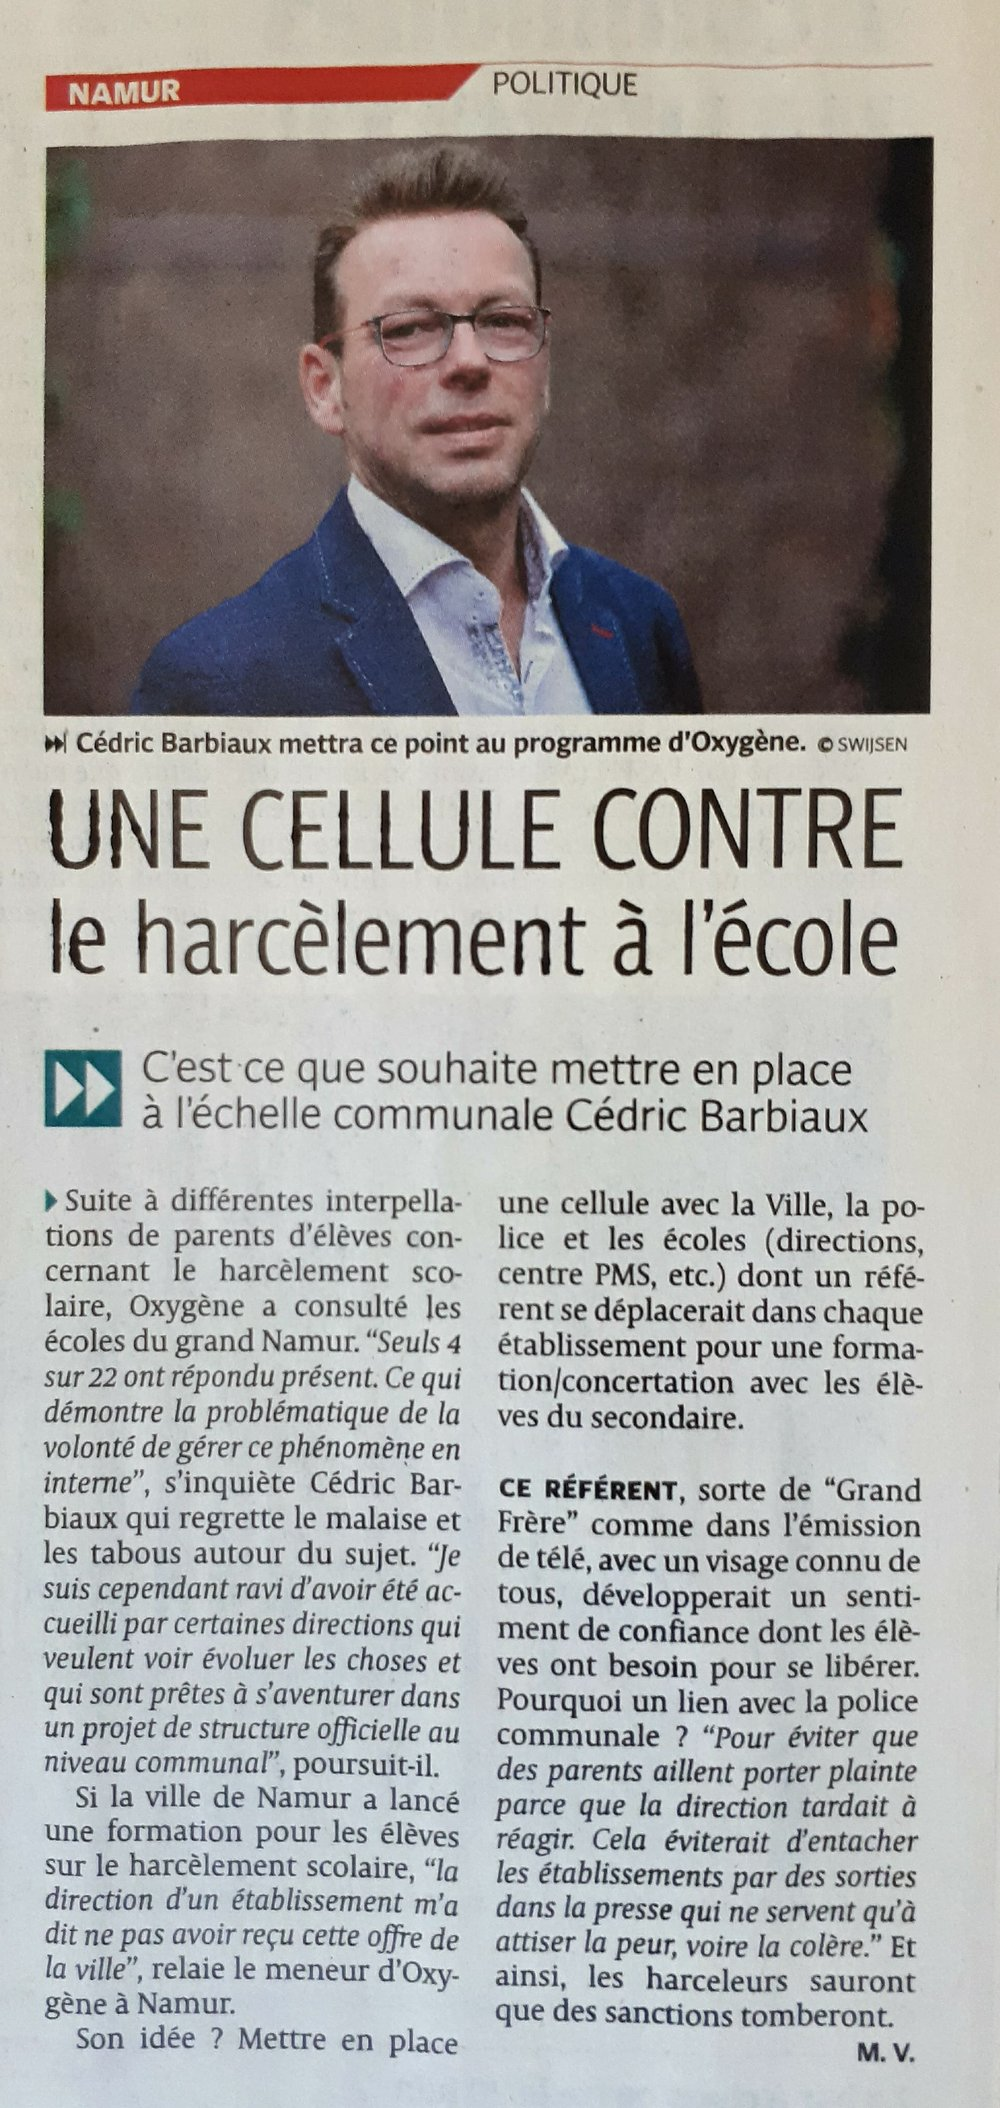 La DH/Les Sports, 22.05.2018